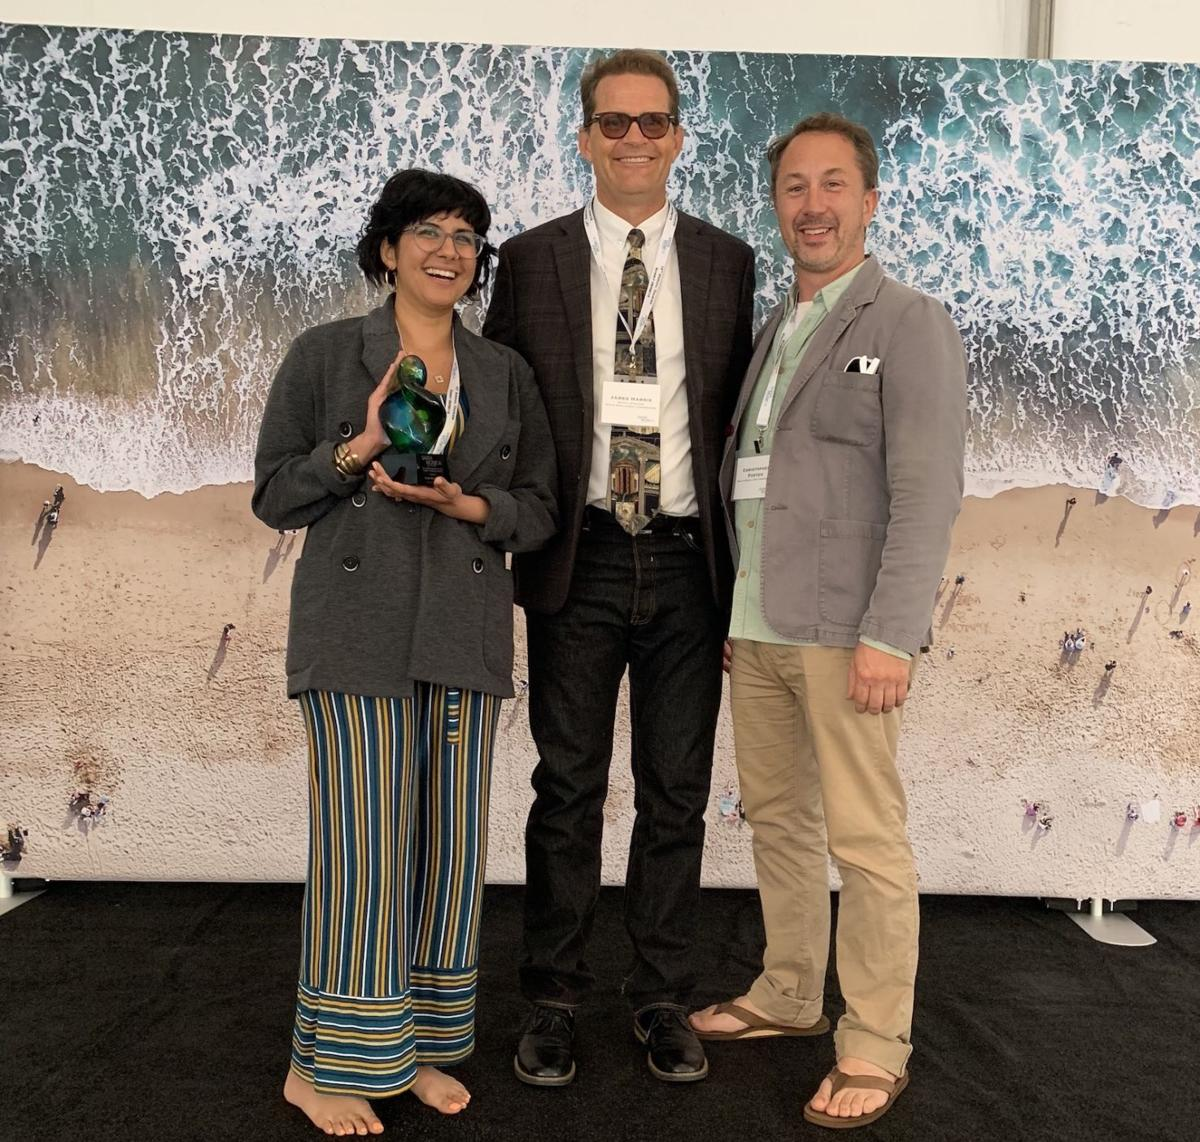 Chris Foster - Santa Monica Pier Award